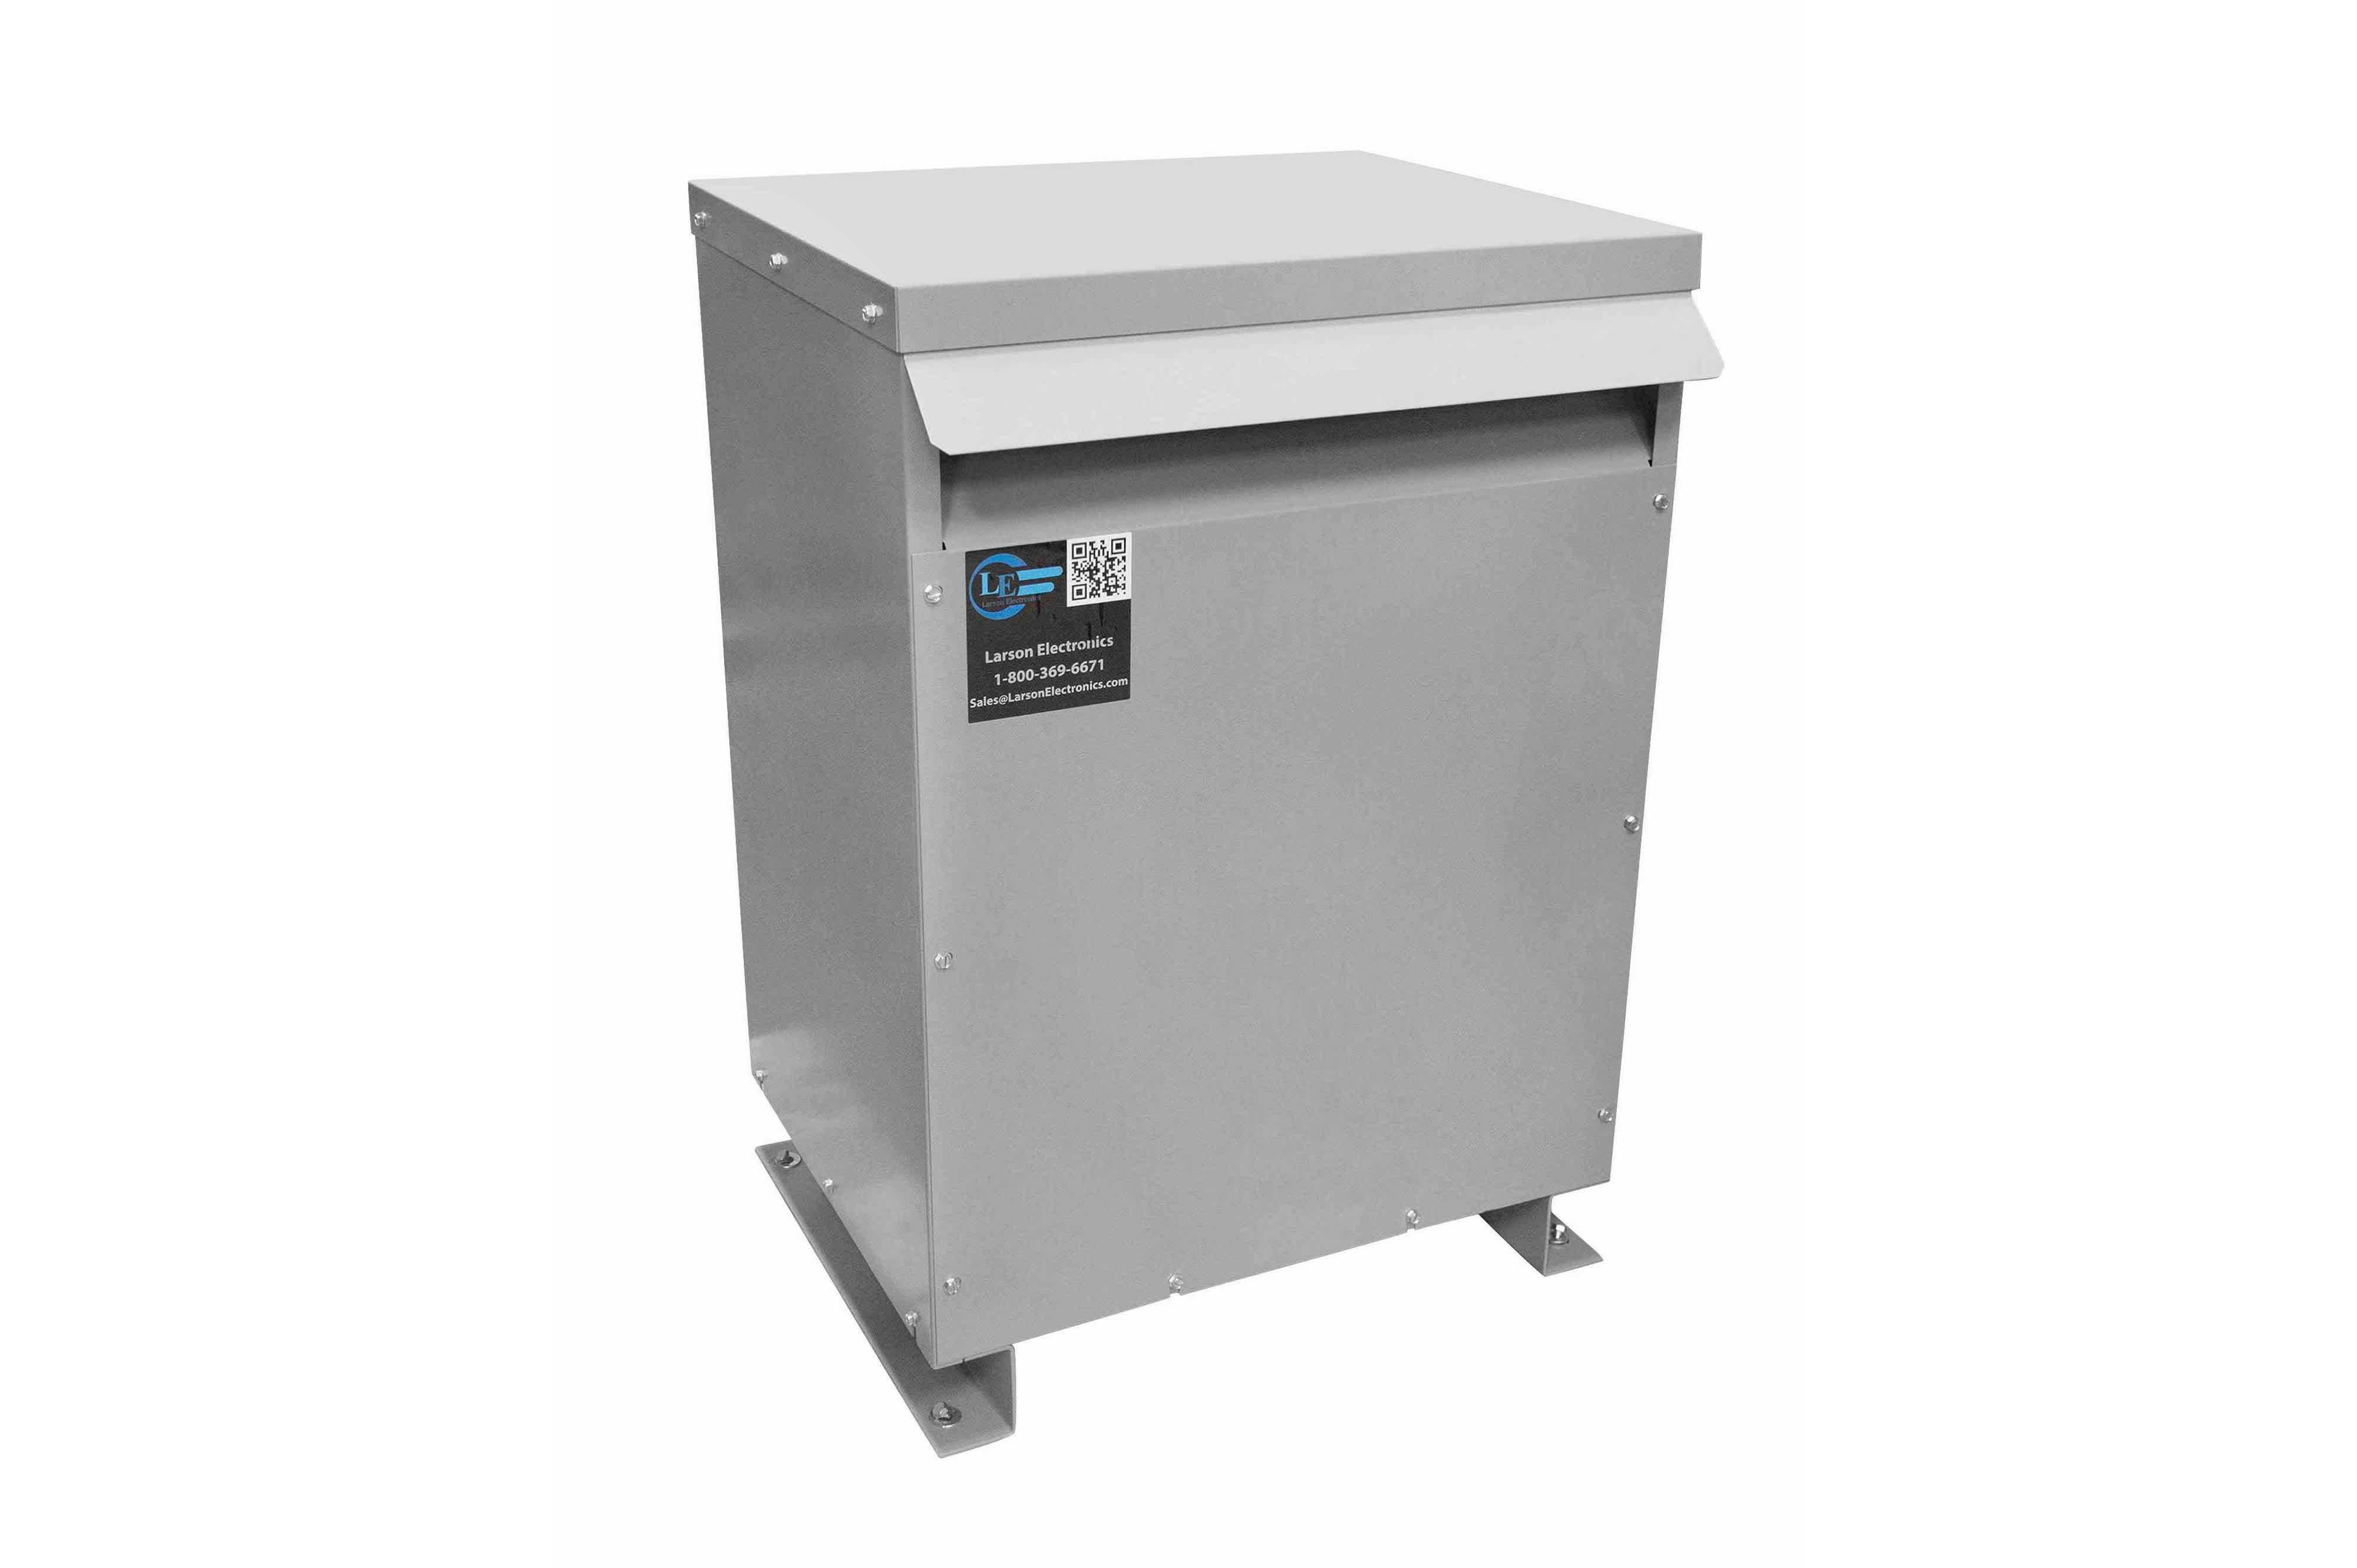 100 kVA 3PH Isolation Transformer, 208V Wye Primary, 400Y/231 Wye-N Secondary, N3R, Ventilated, 60 Hz